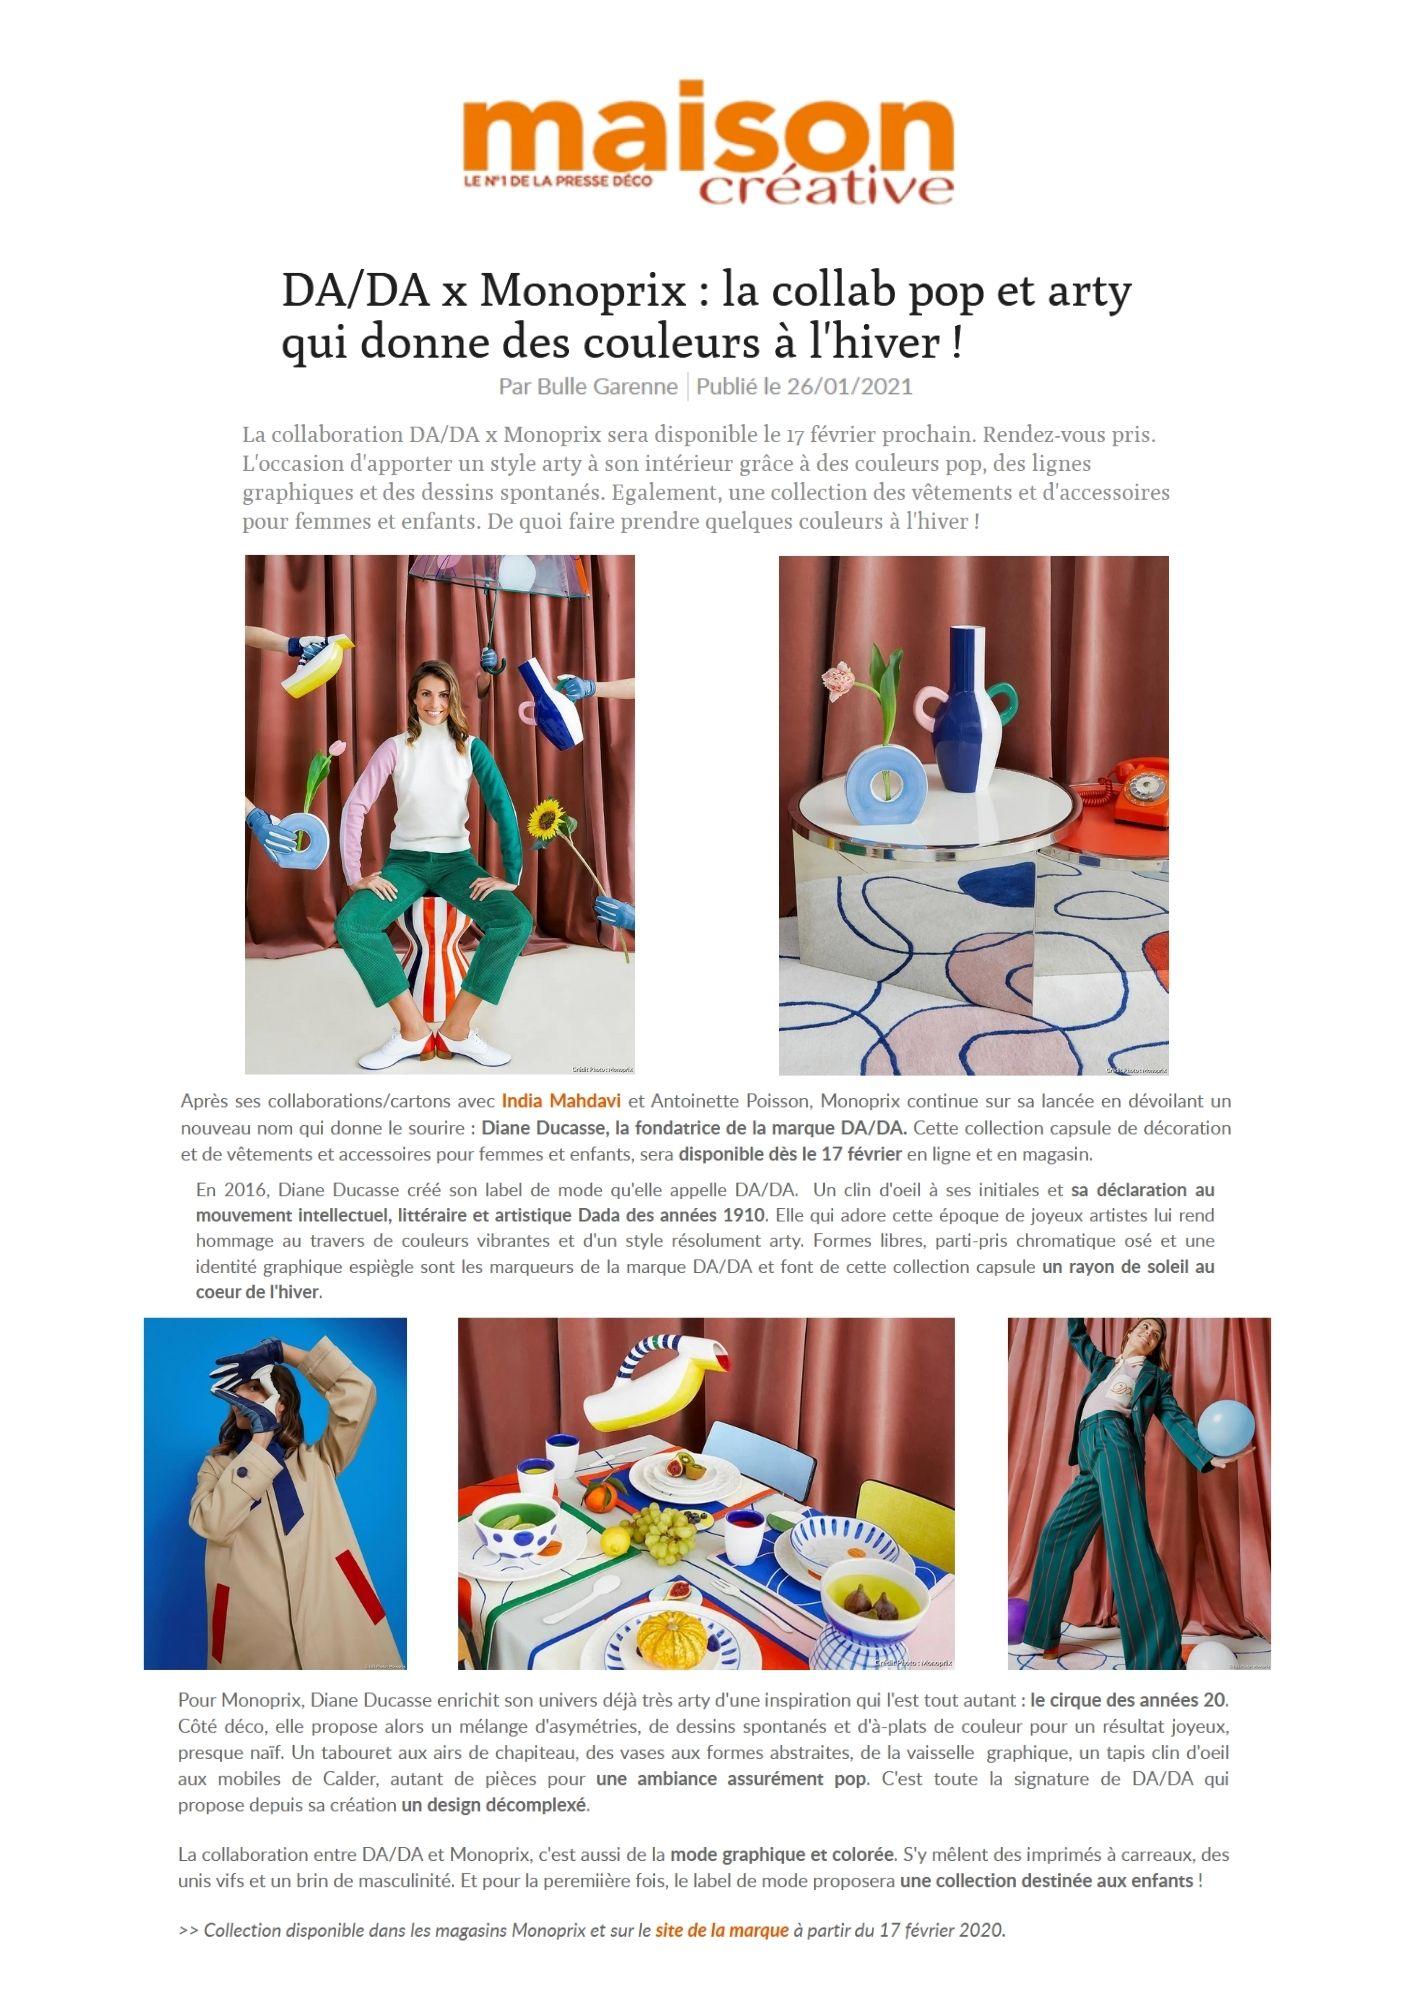 dada-diane-ducasse-maison-creative-presse-janvier-2021